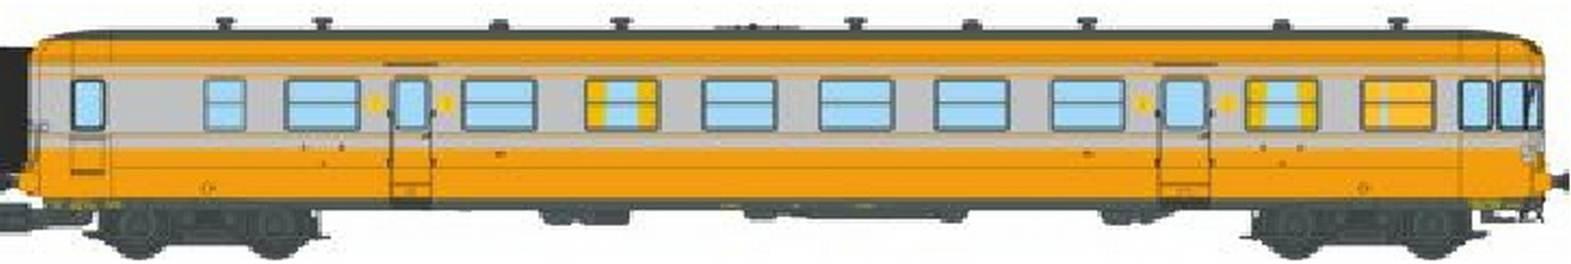 rgp orange 2